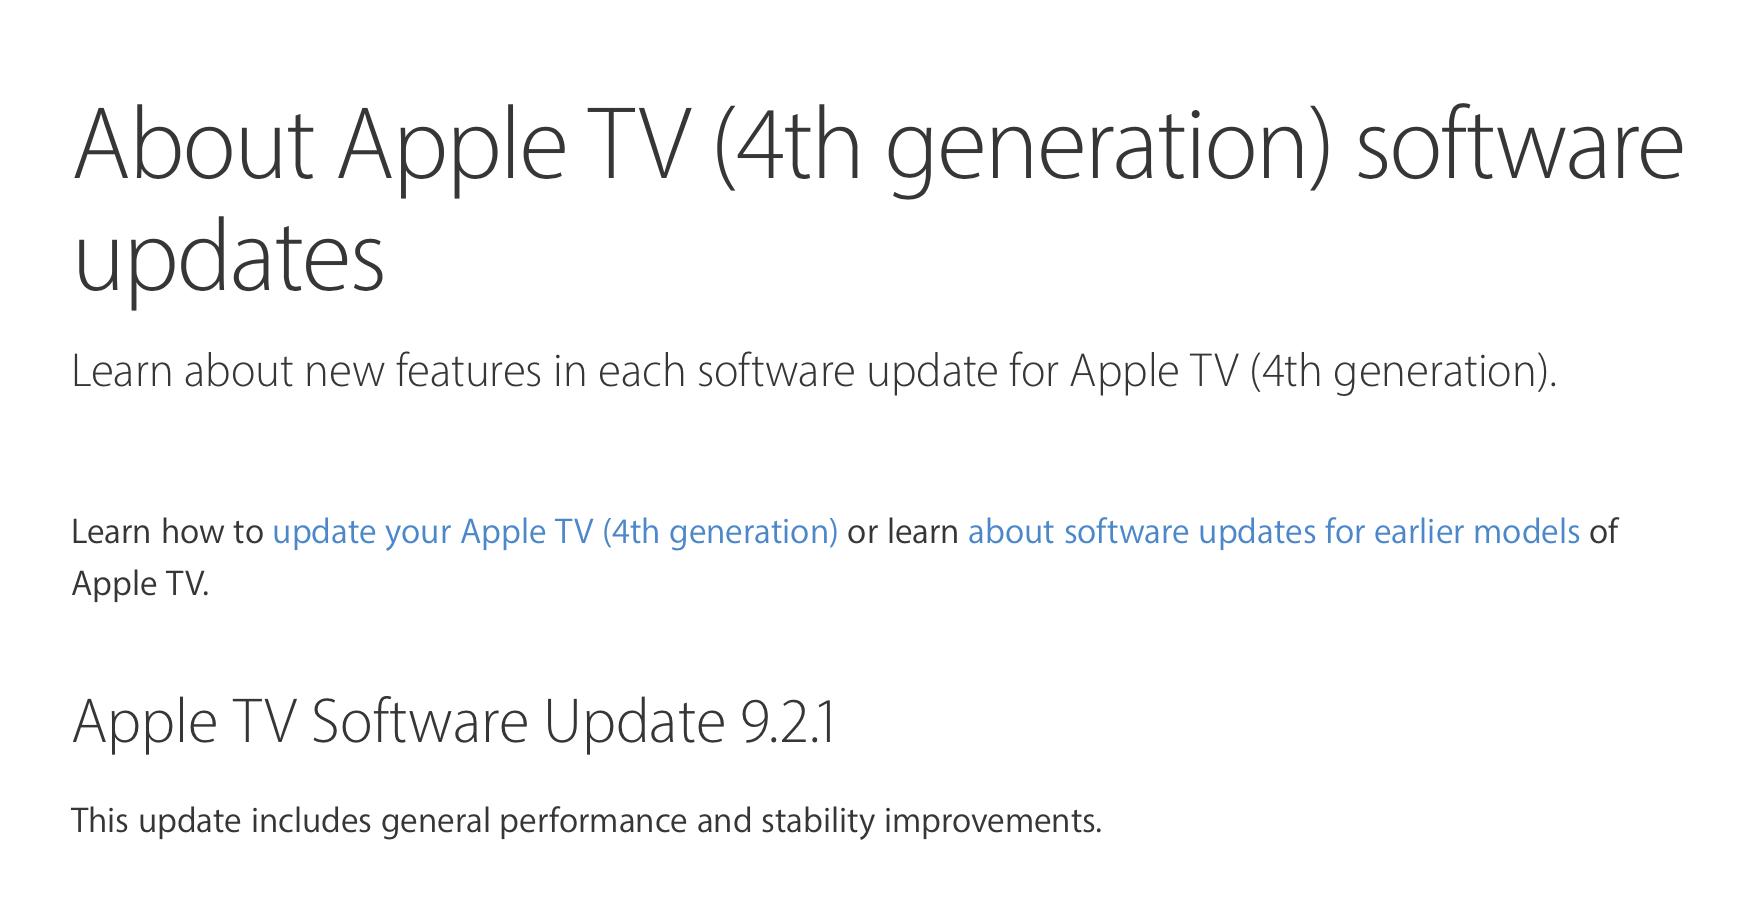 apple_tv_software_update_9.2.1